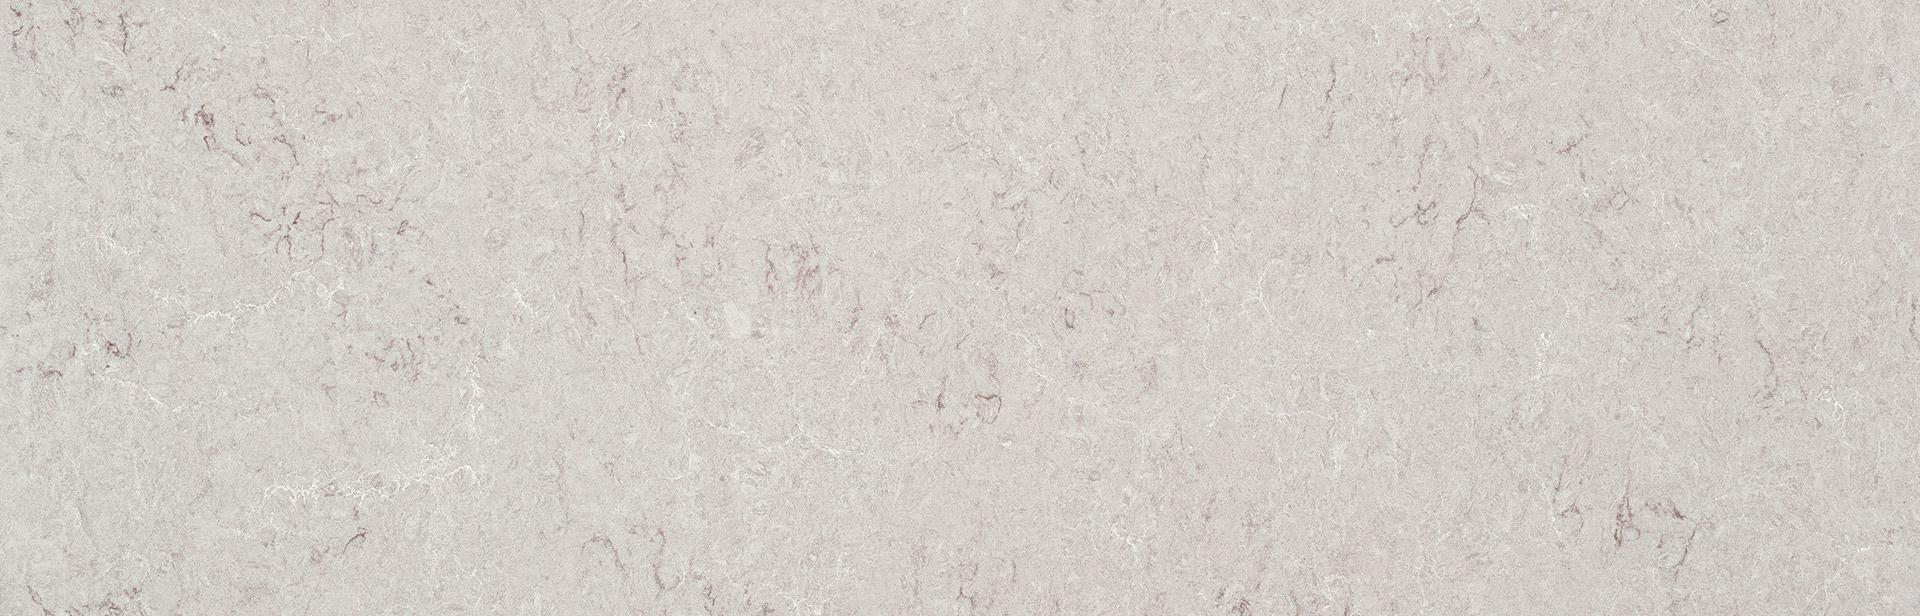 6131_Bianco-Drift_Full_Slab-1920X616-1